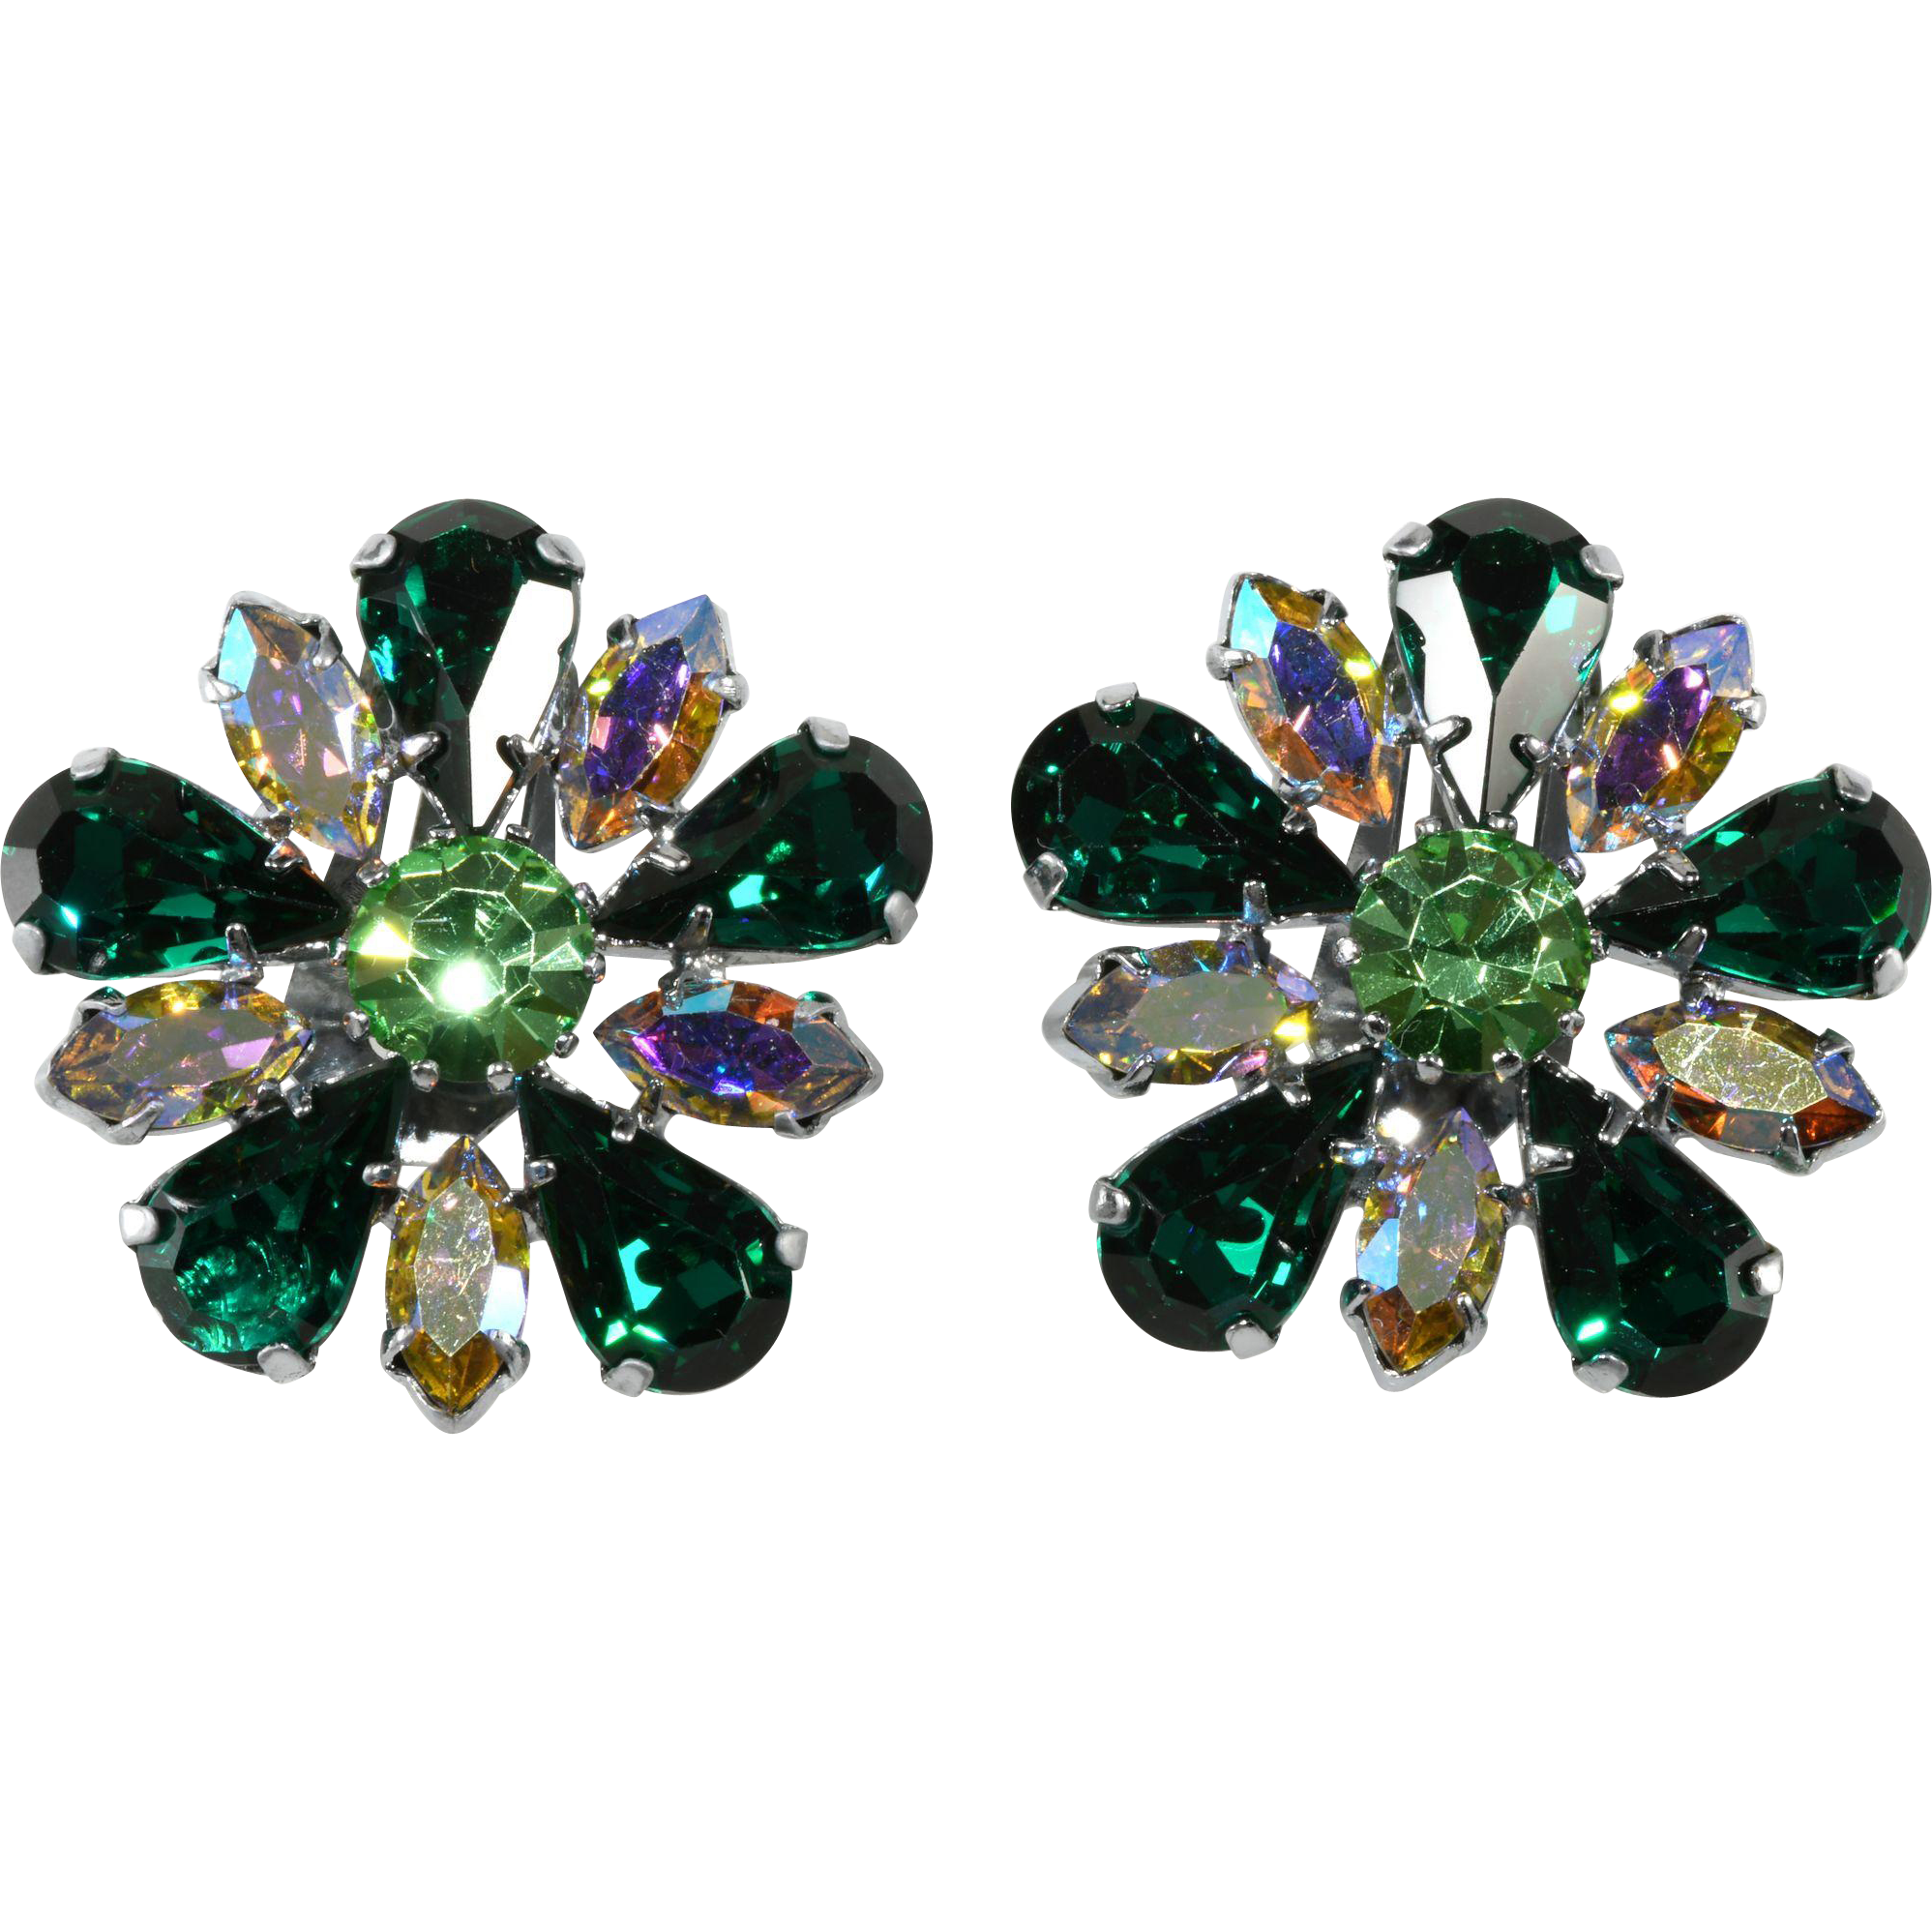 Green and Iridescent Rhinestone Flower Earrings 1950s Vintage